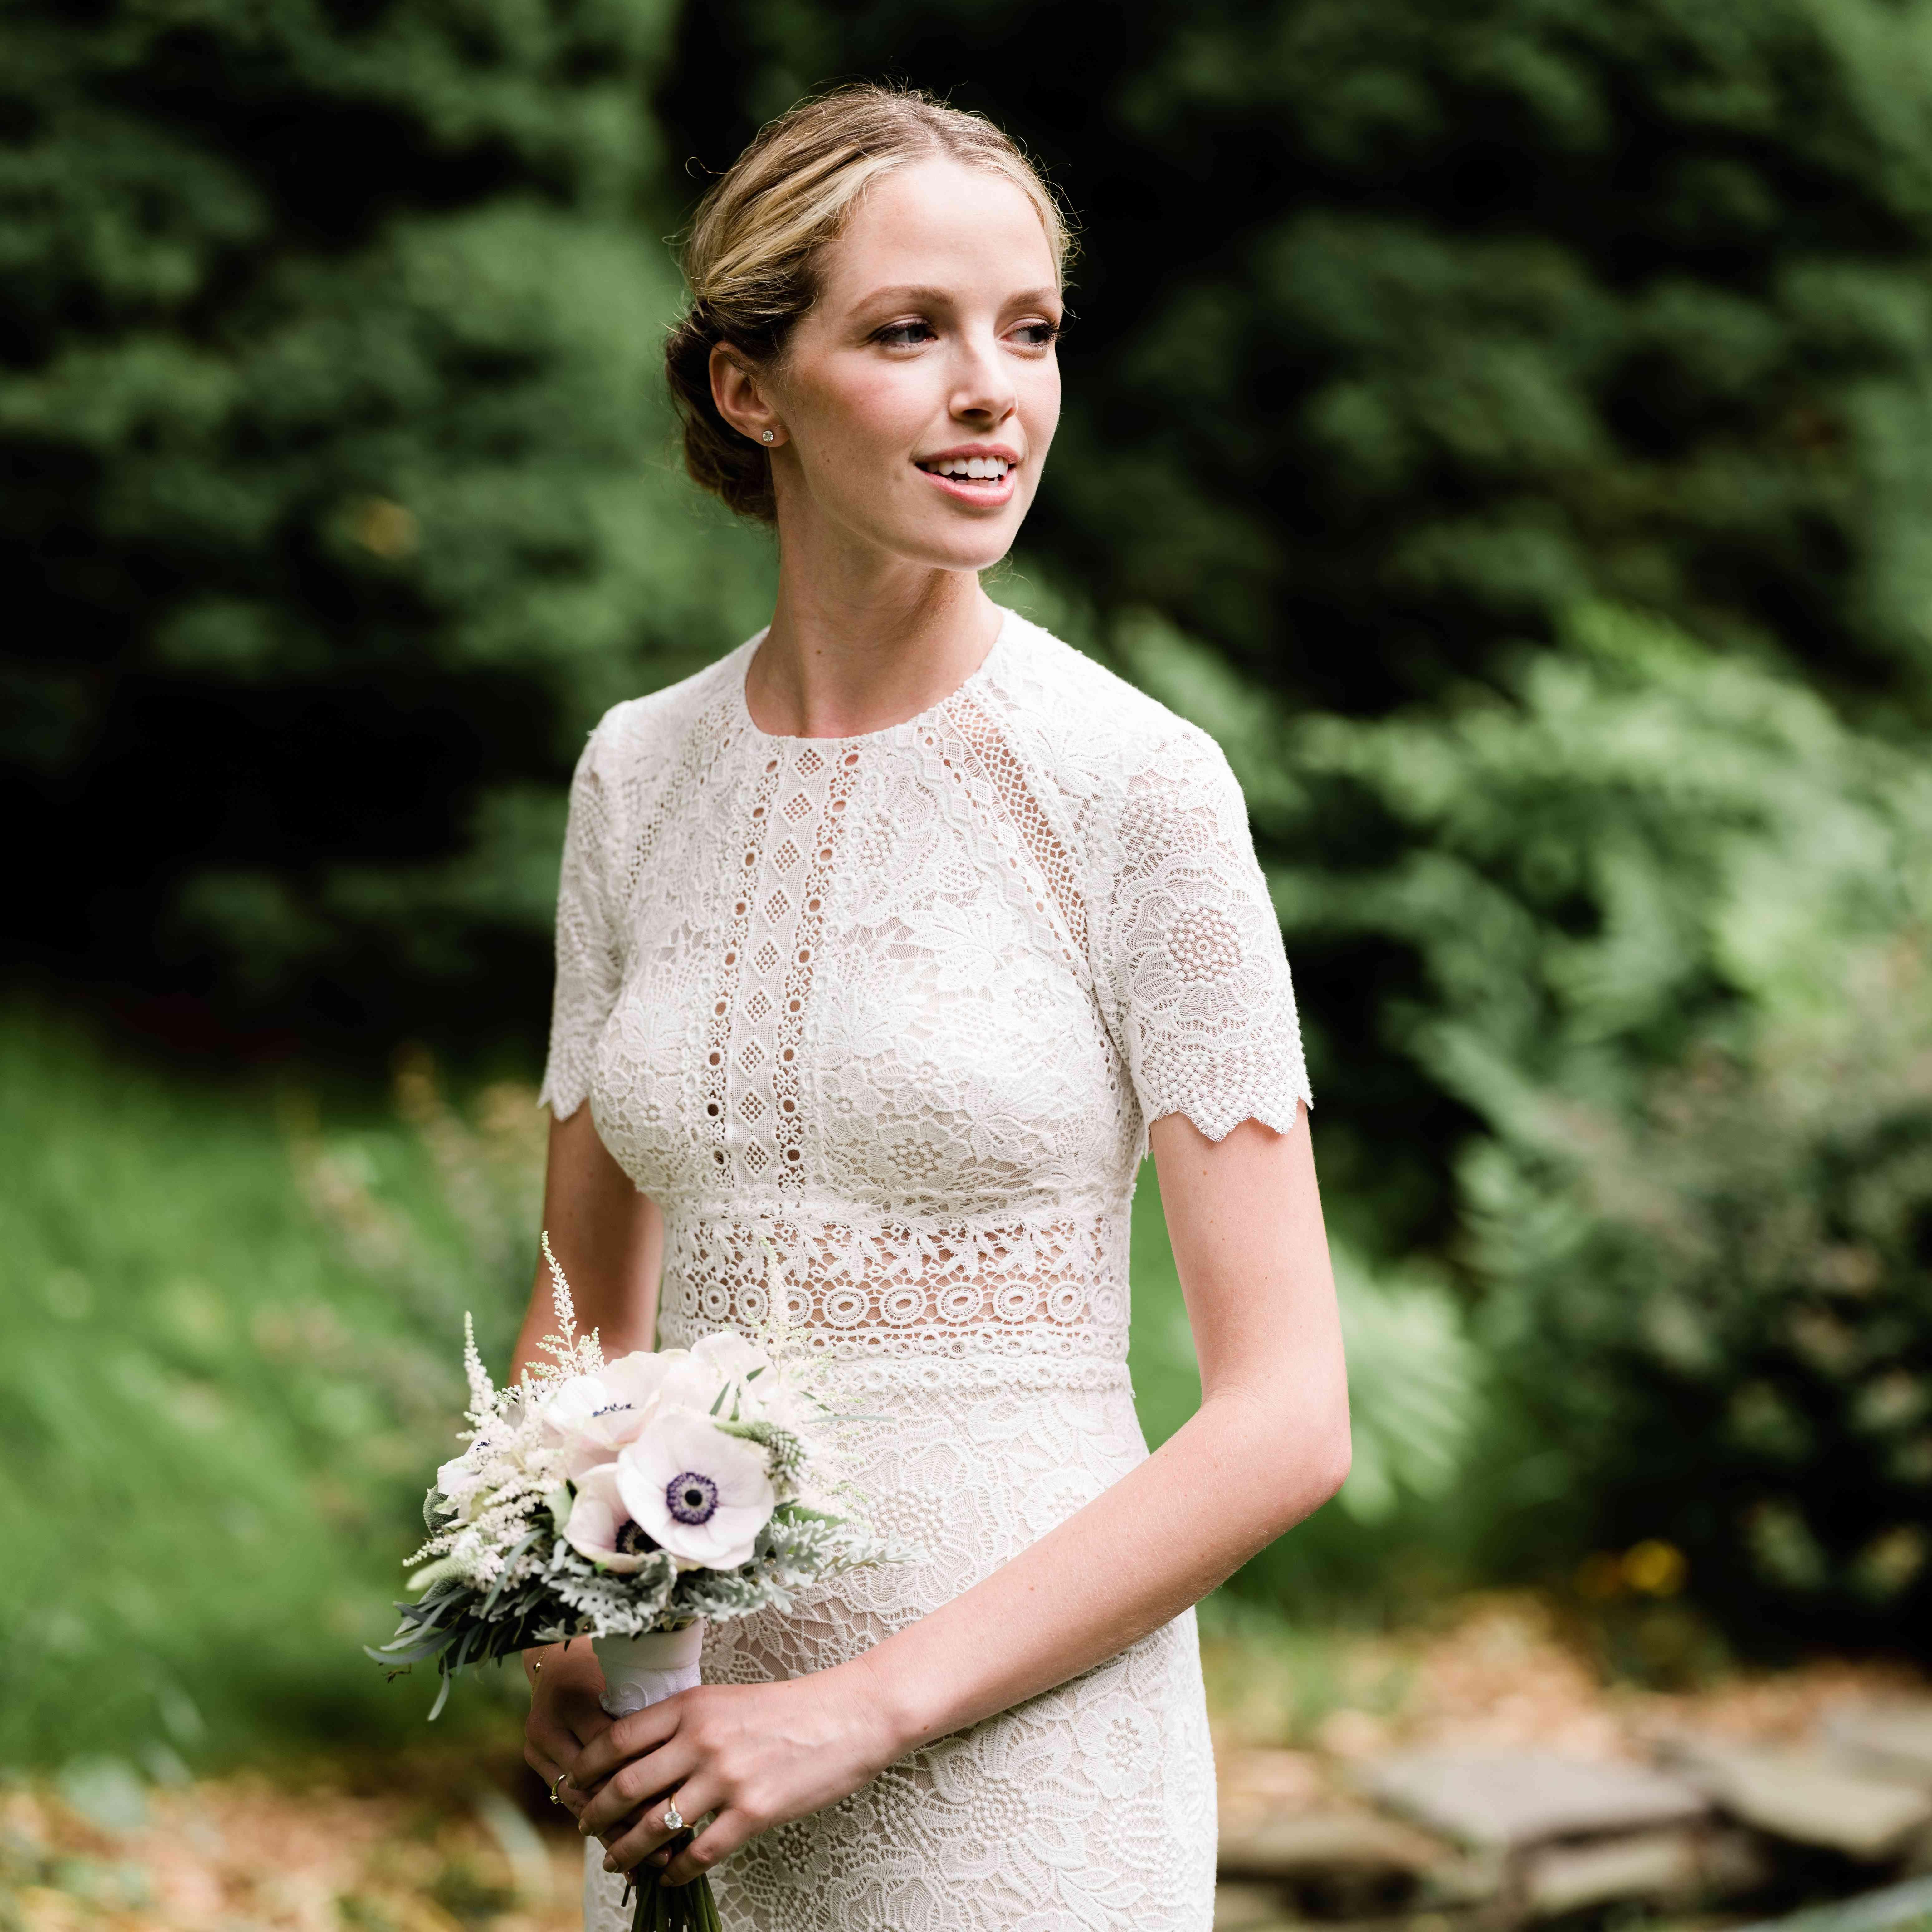 <p>short sleeve lace wedding dress</p><br><br>